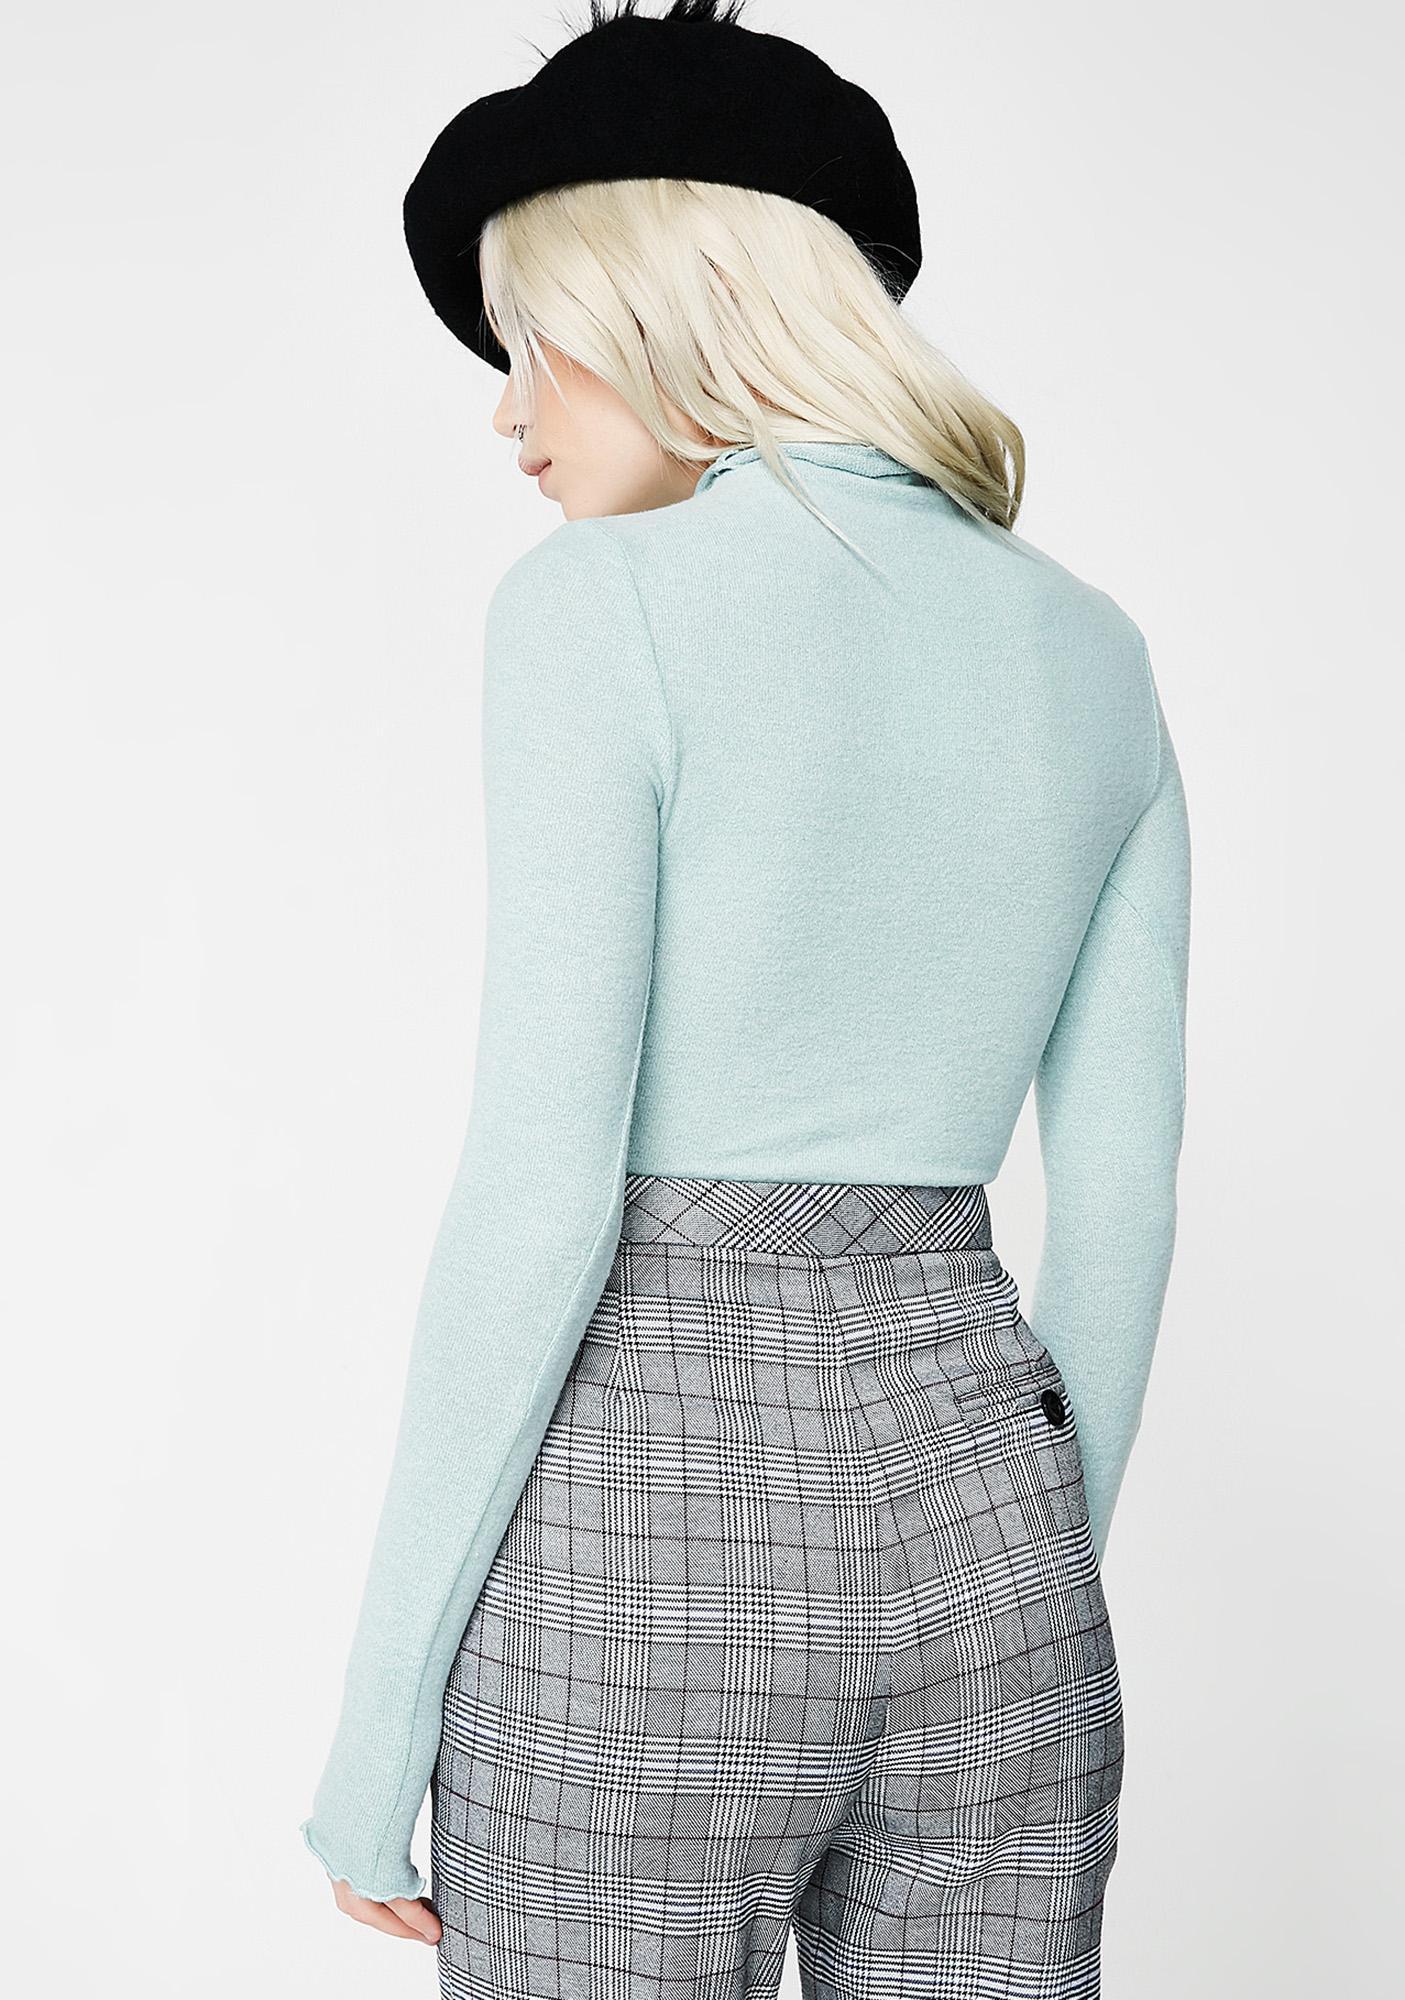 Play 4 Keeps Sweater